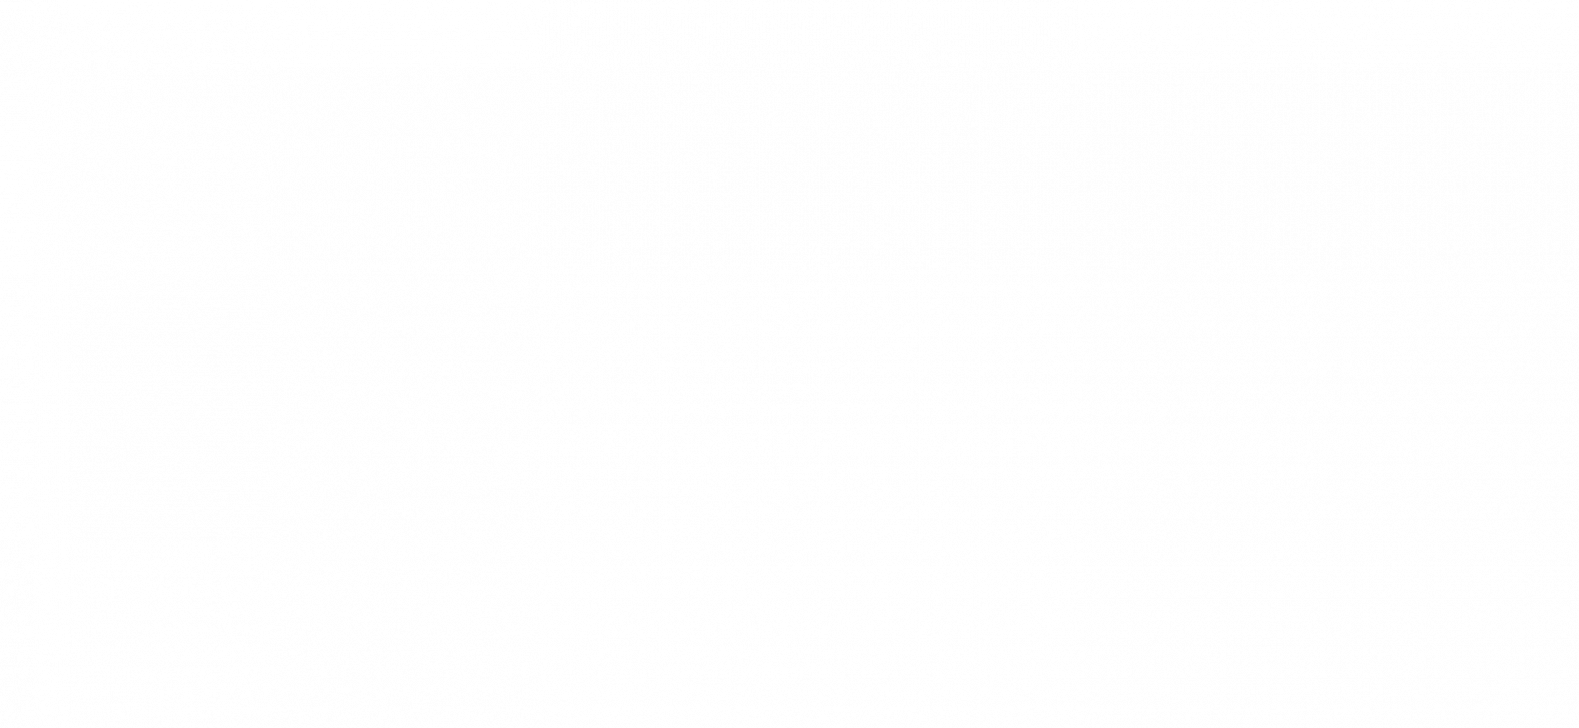 2015-07-07_011